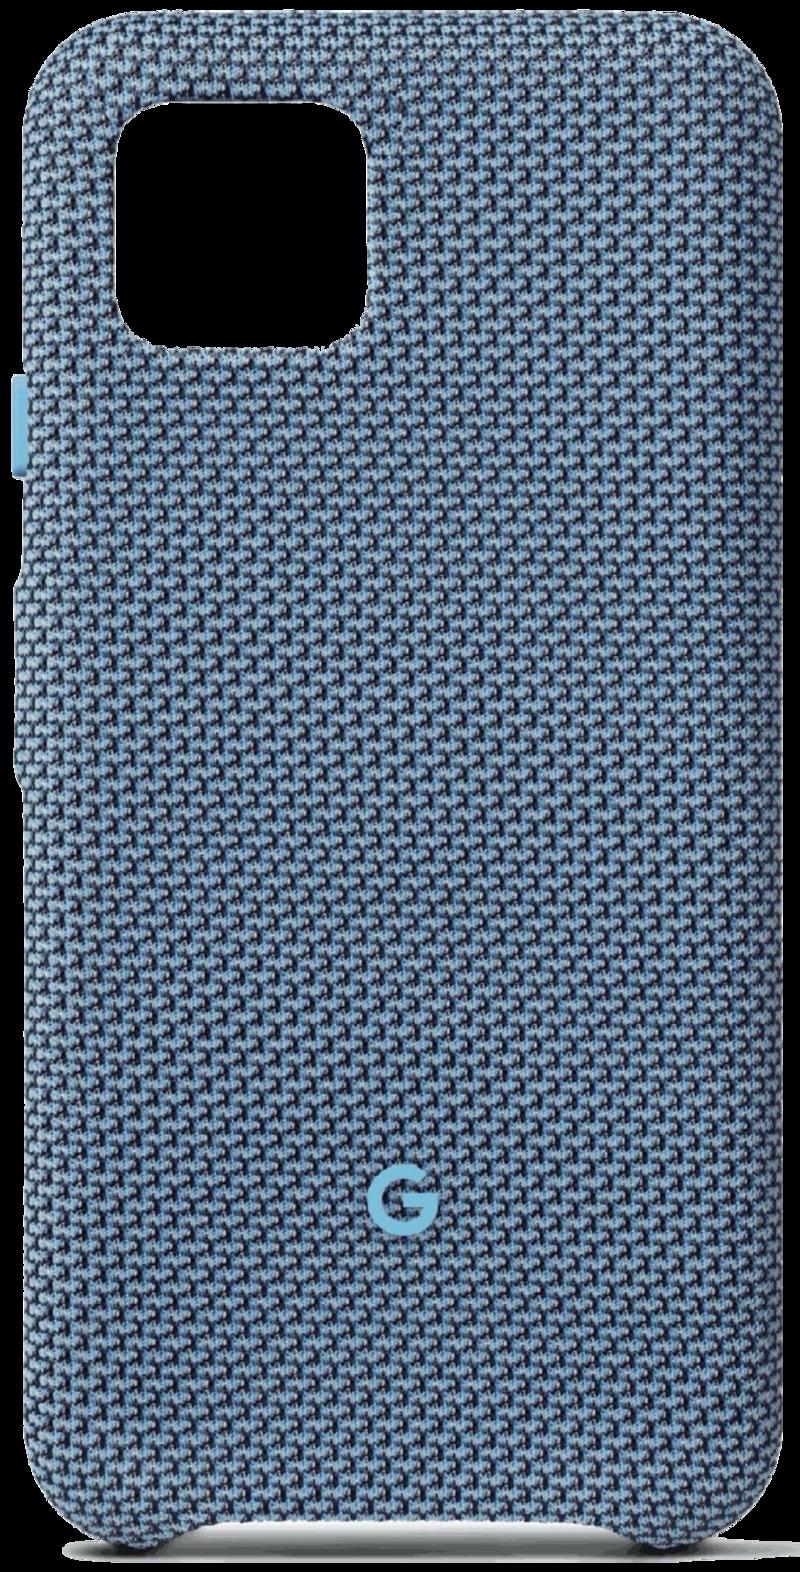 google-fabric-case-blue-pixel-4-cropped.